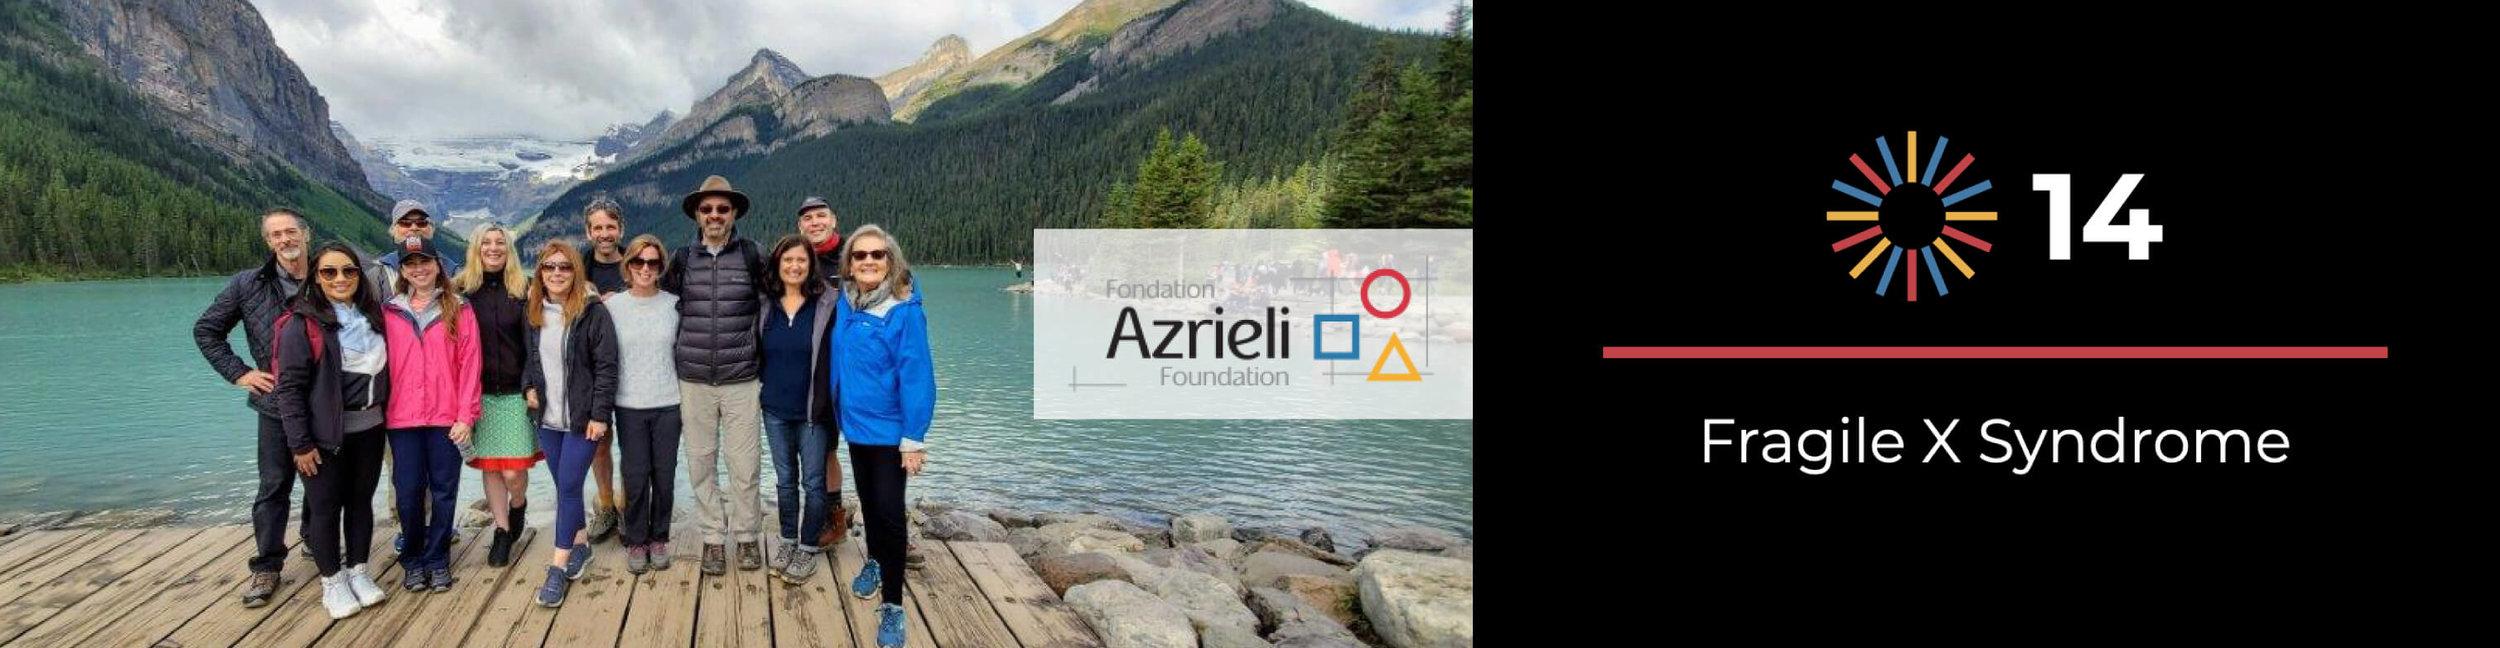 Azrieli-Foundation-ShebaWebsite.jpg